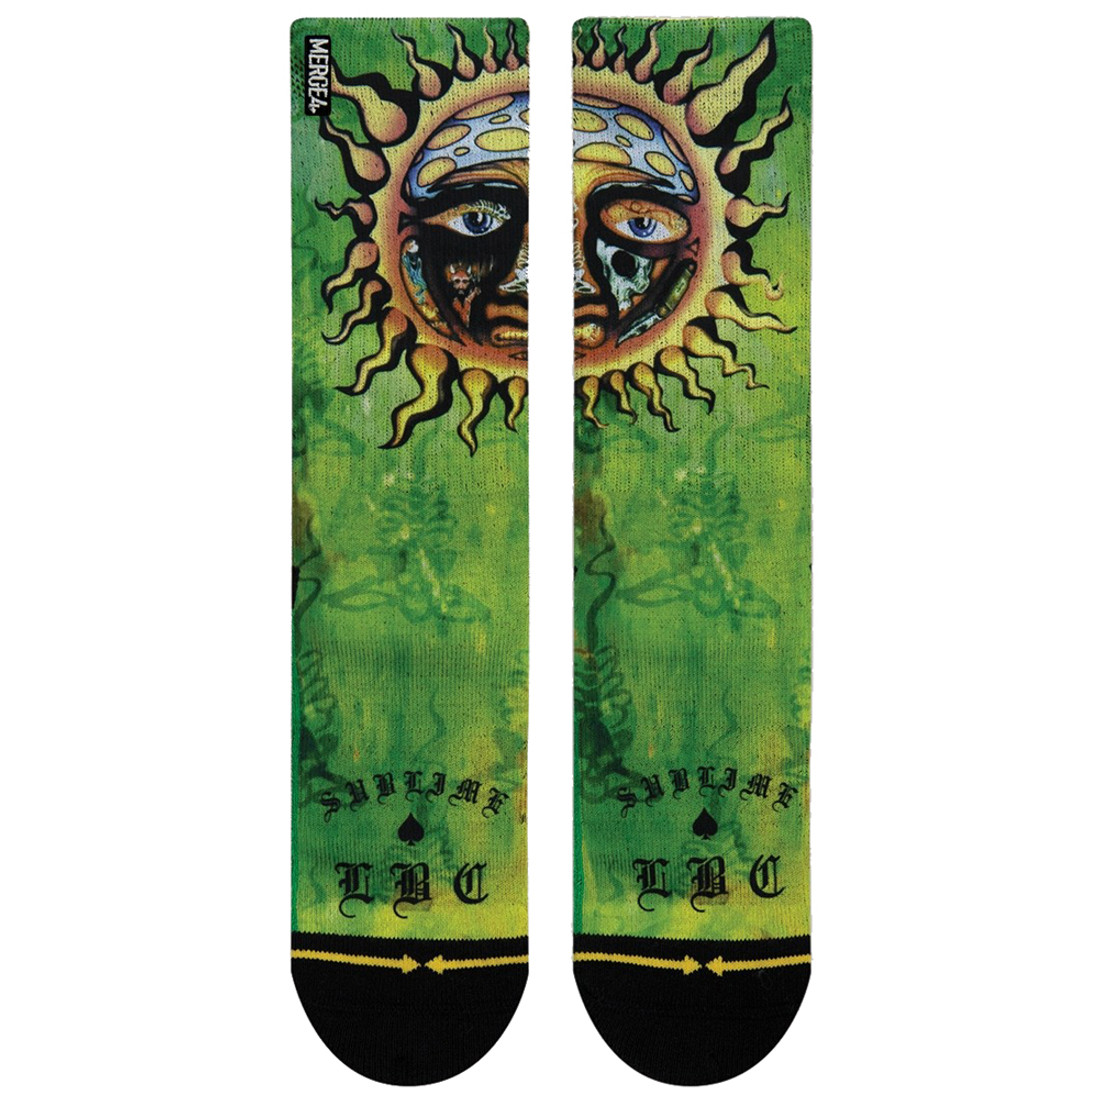 Merge4 Sublime Sun Crew Socks